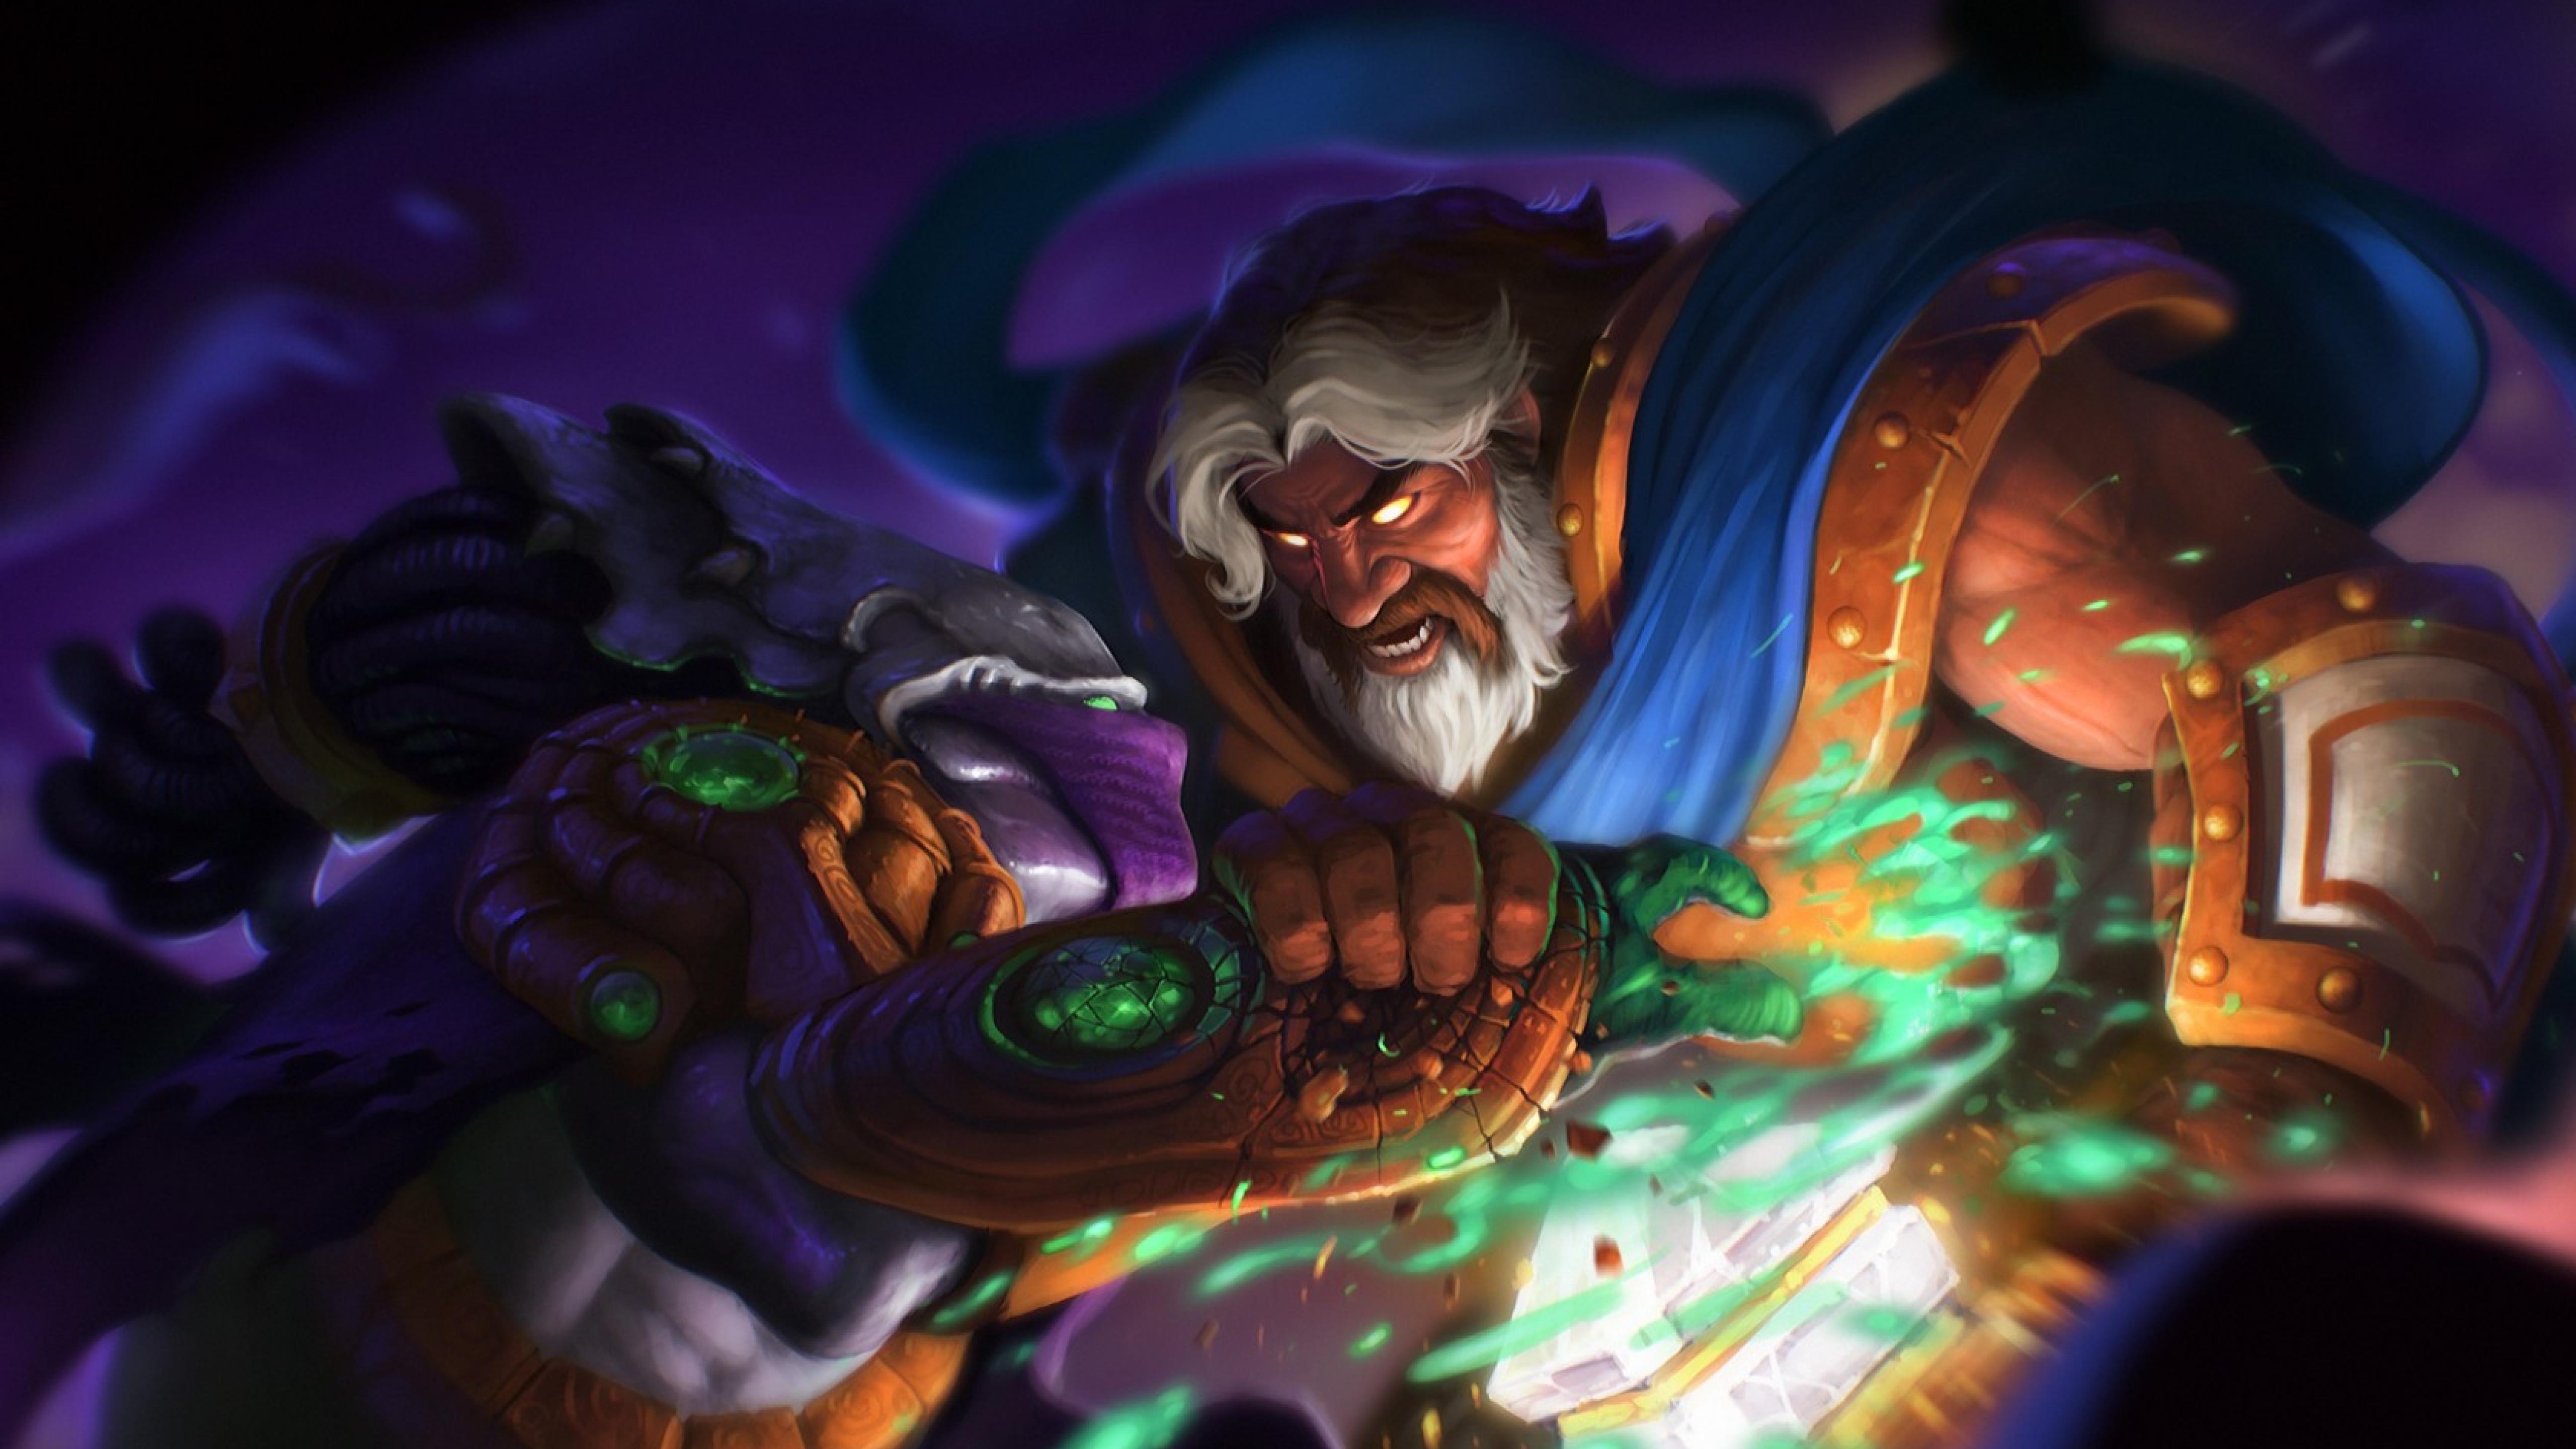 5120x2880 World Of Warcraft Heroes Of The Storm Zeratul 5k